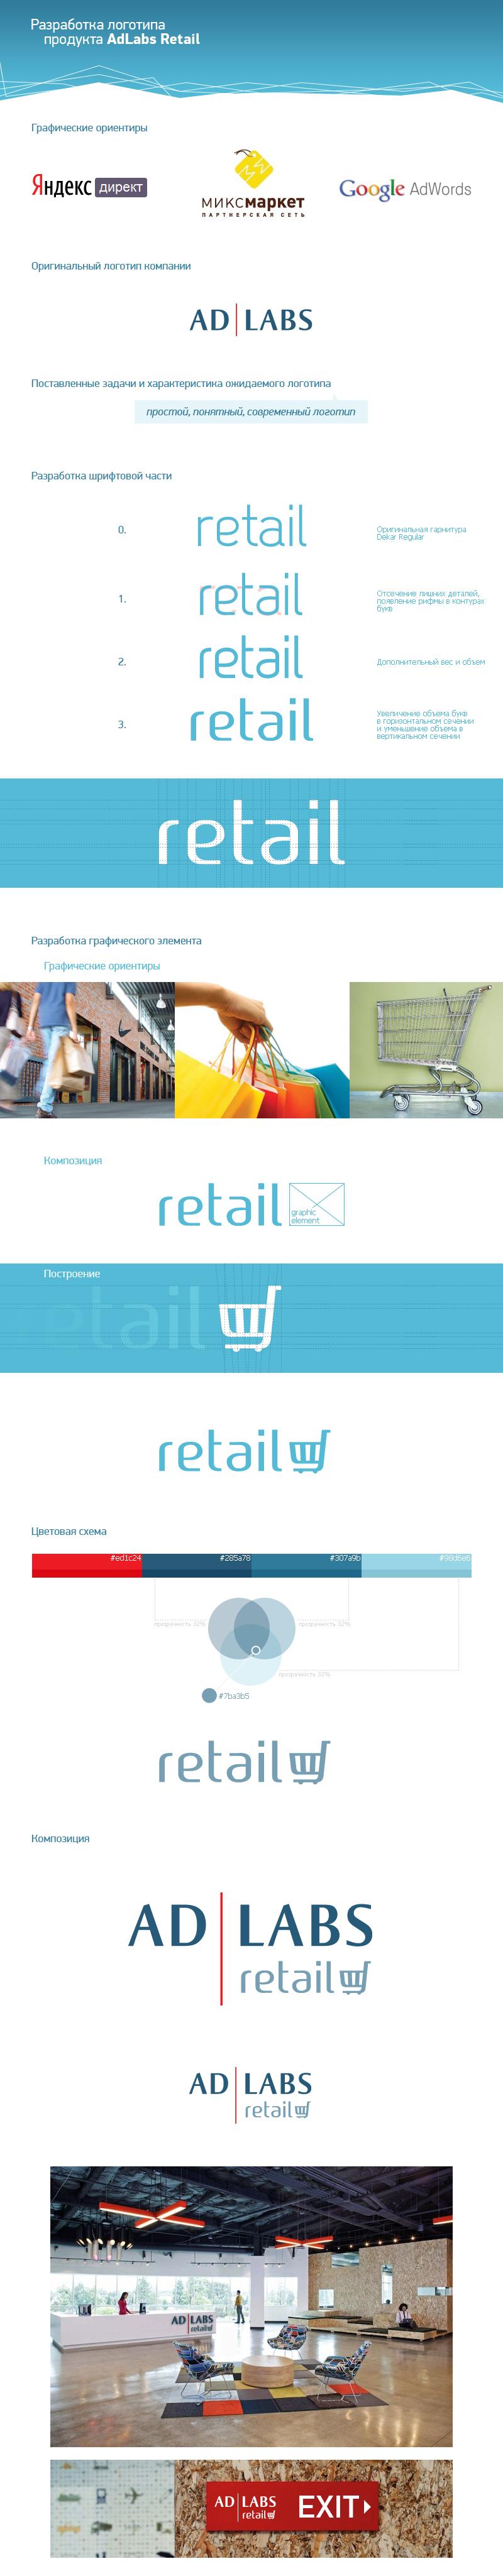 AdLab Retail